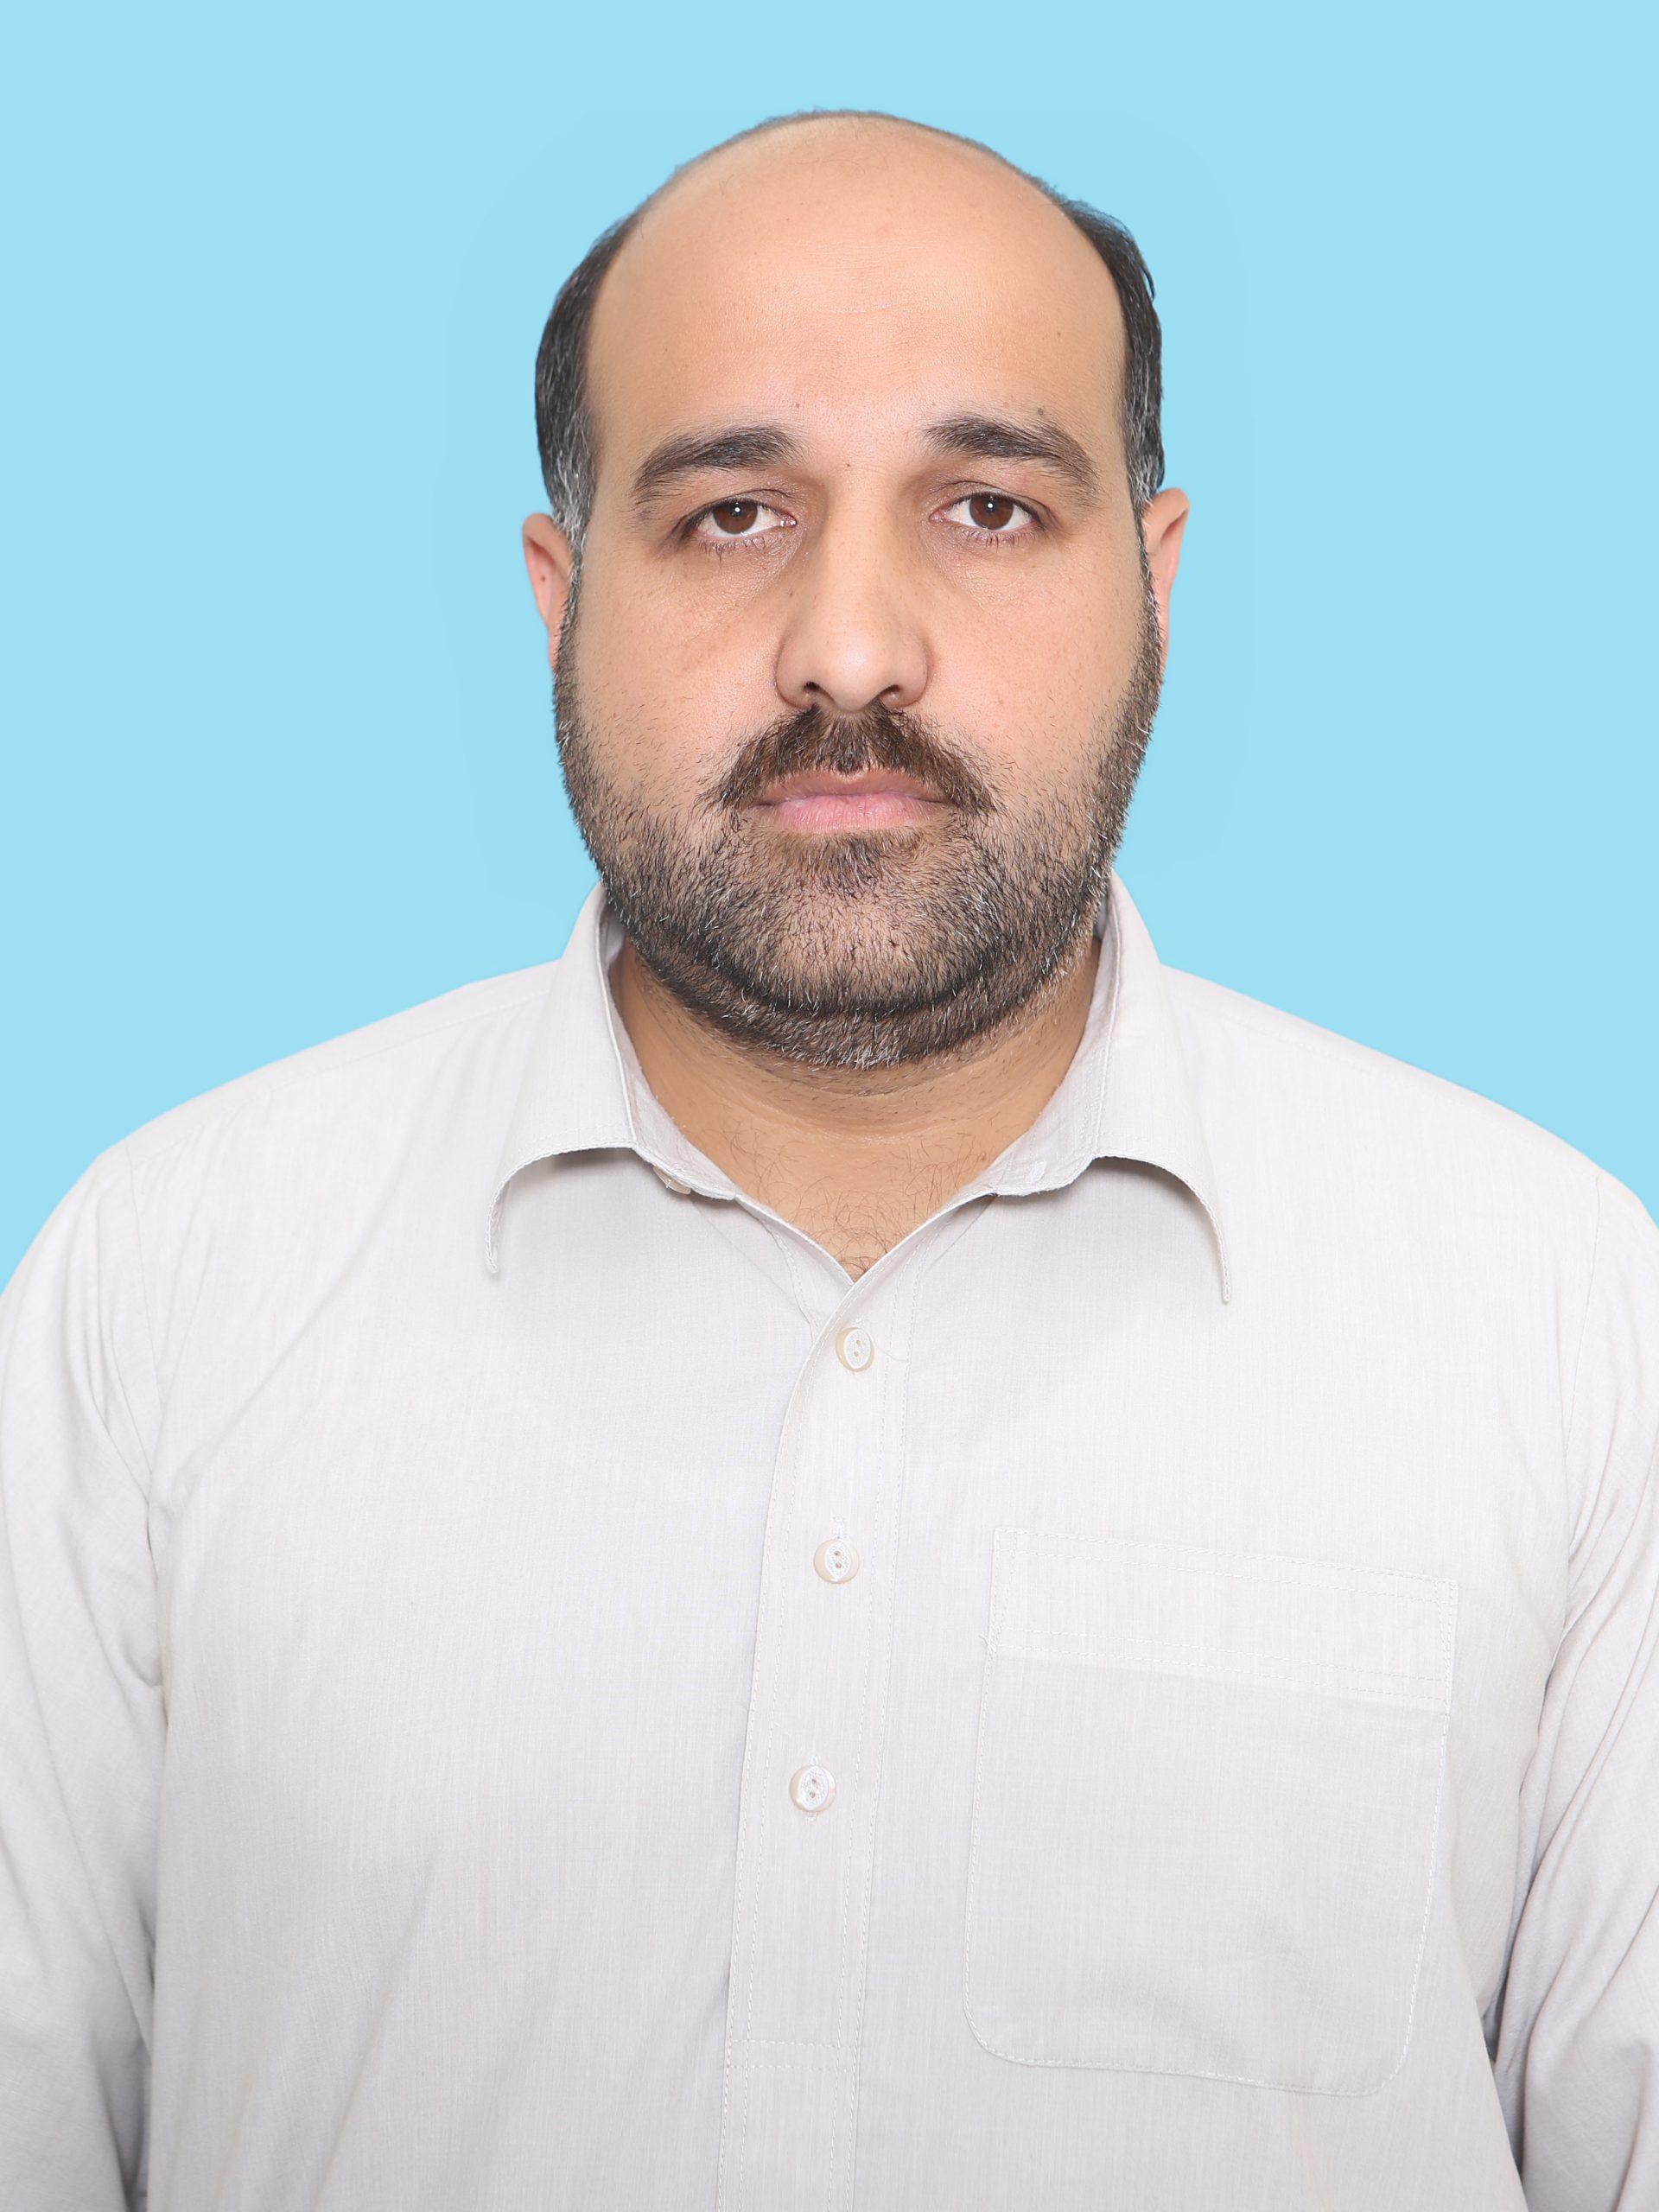 Imran Qayyum